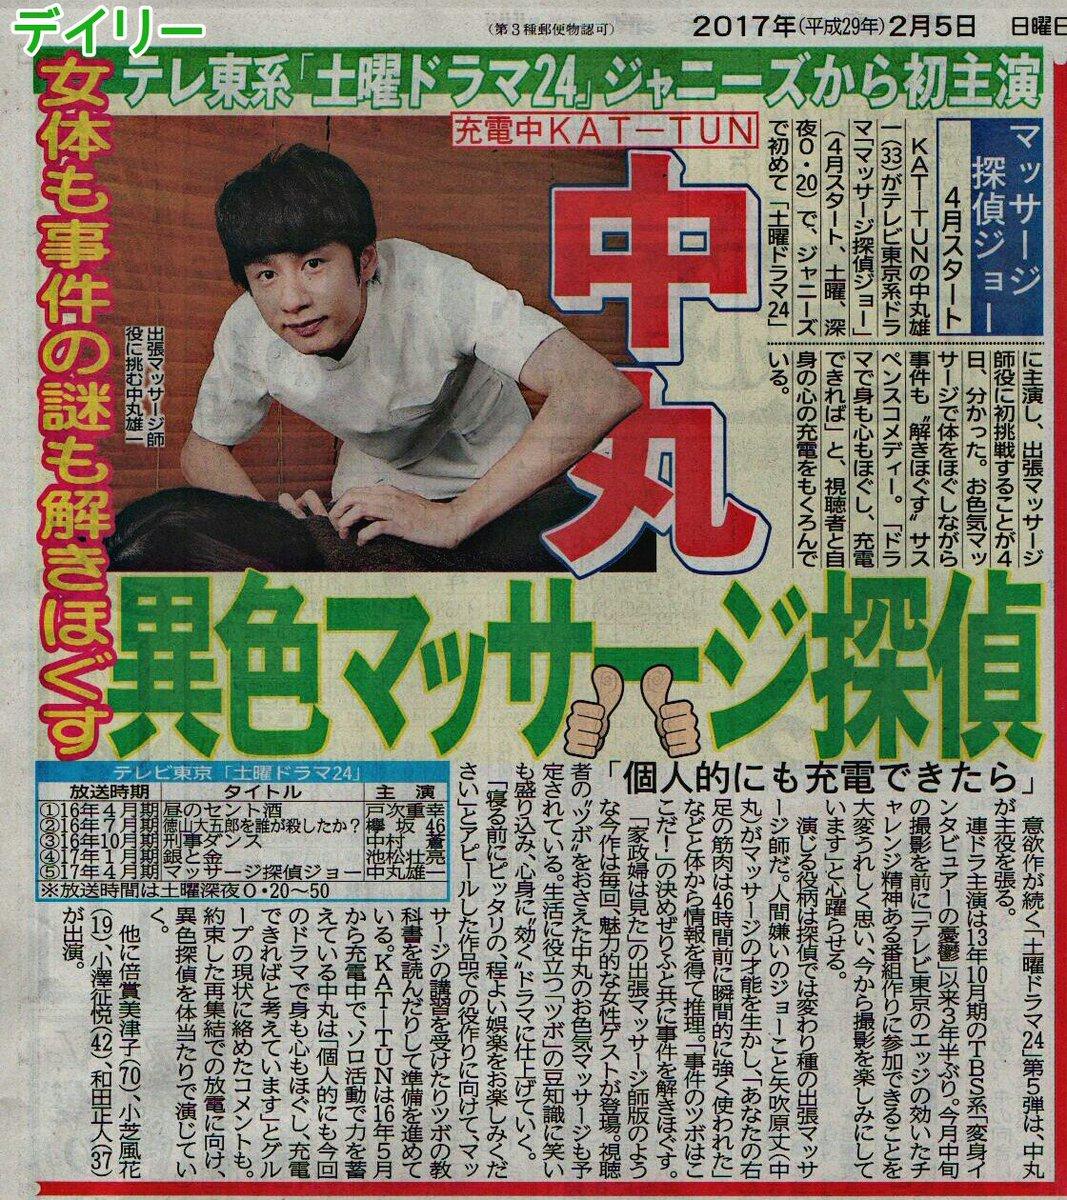 KAT-TUN 中丸雄一くん テレ東 土24ドラマ「マッサージ探偵ジョー」主演(4月スタート)